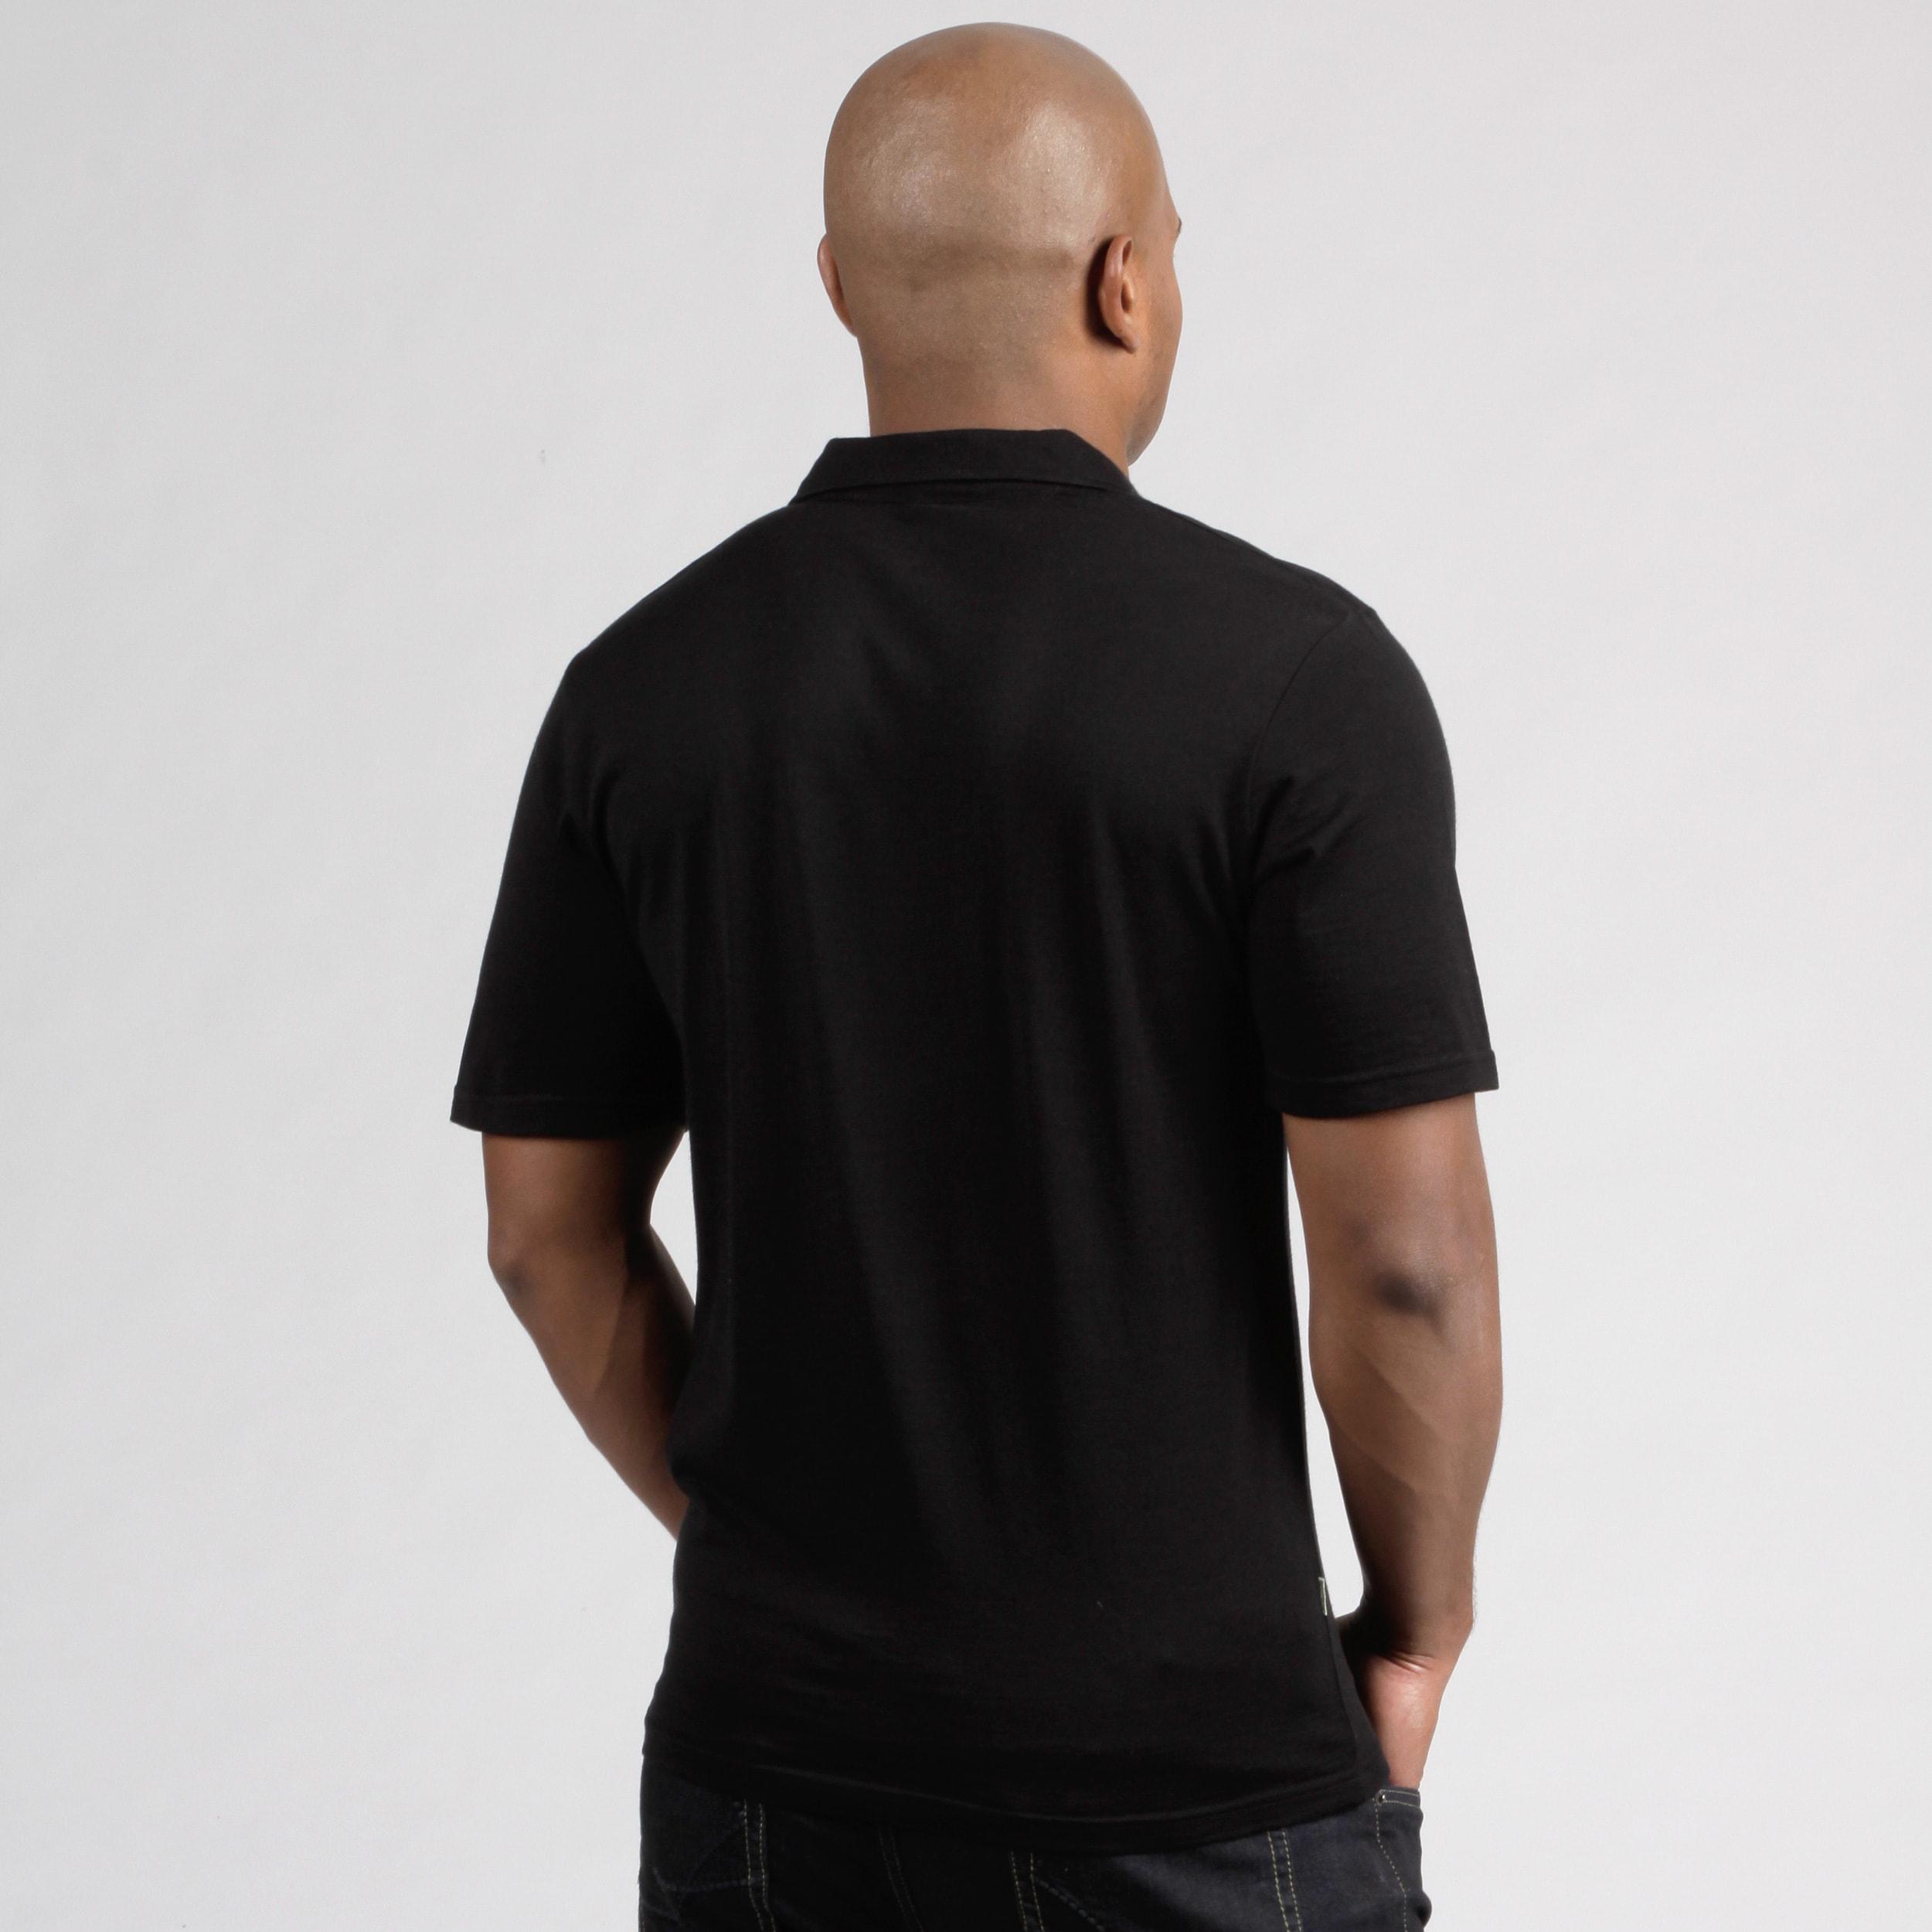 90f267fed3defc Minus33 Men's 'Kearsarge' Black Merino Wool Lightweight Base Layer Polo  Shirt